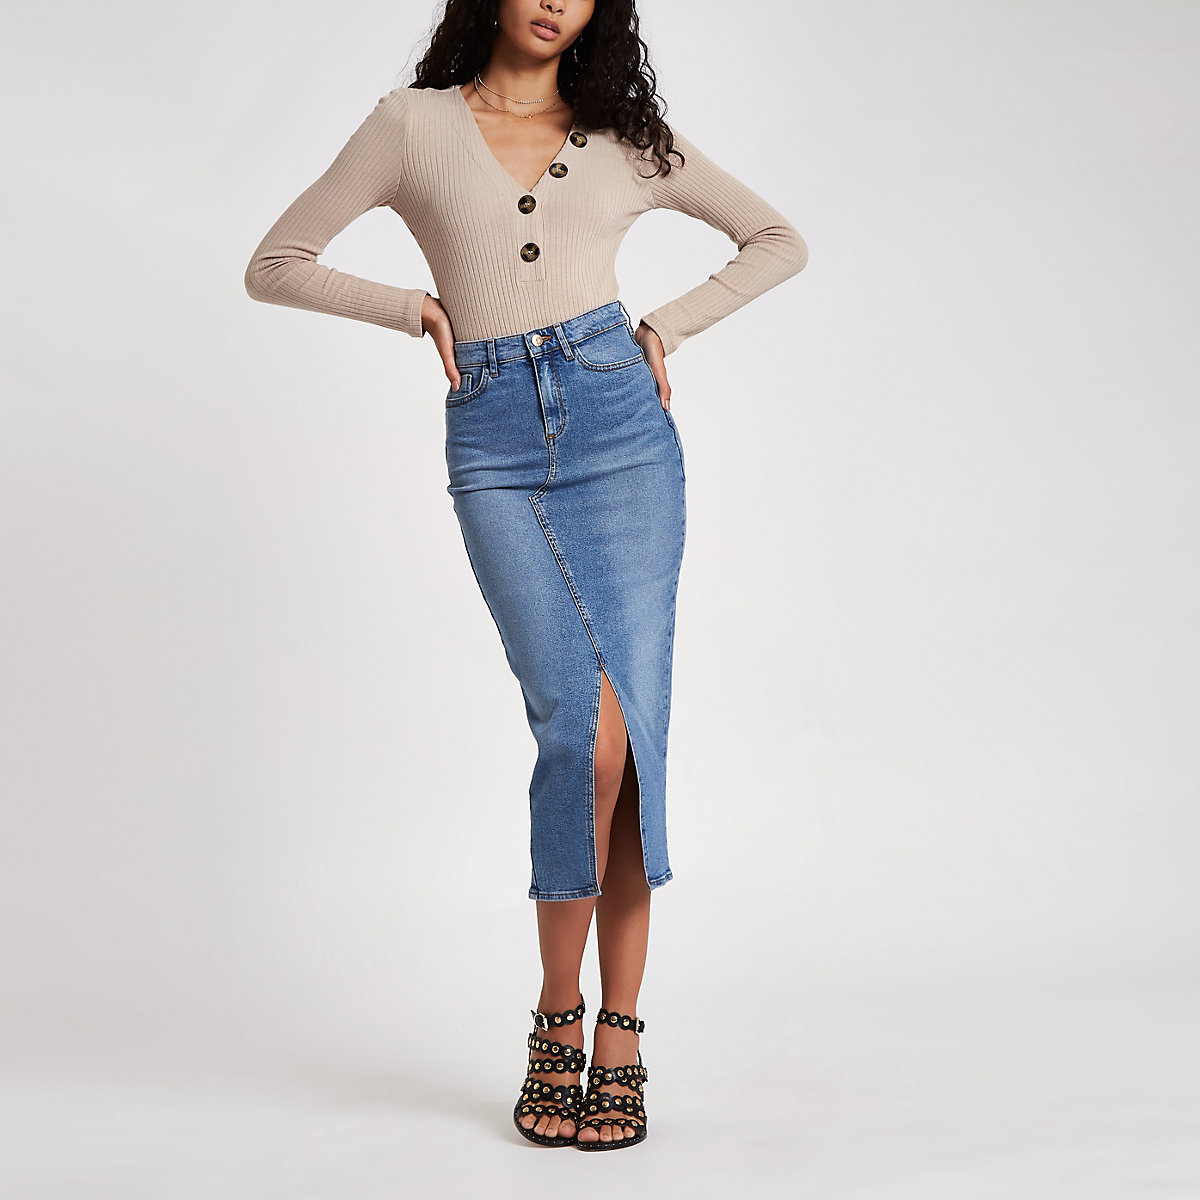 Blue split front denim longline pencil skirt